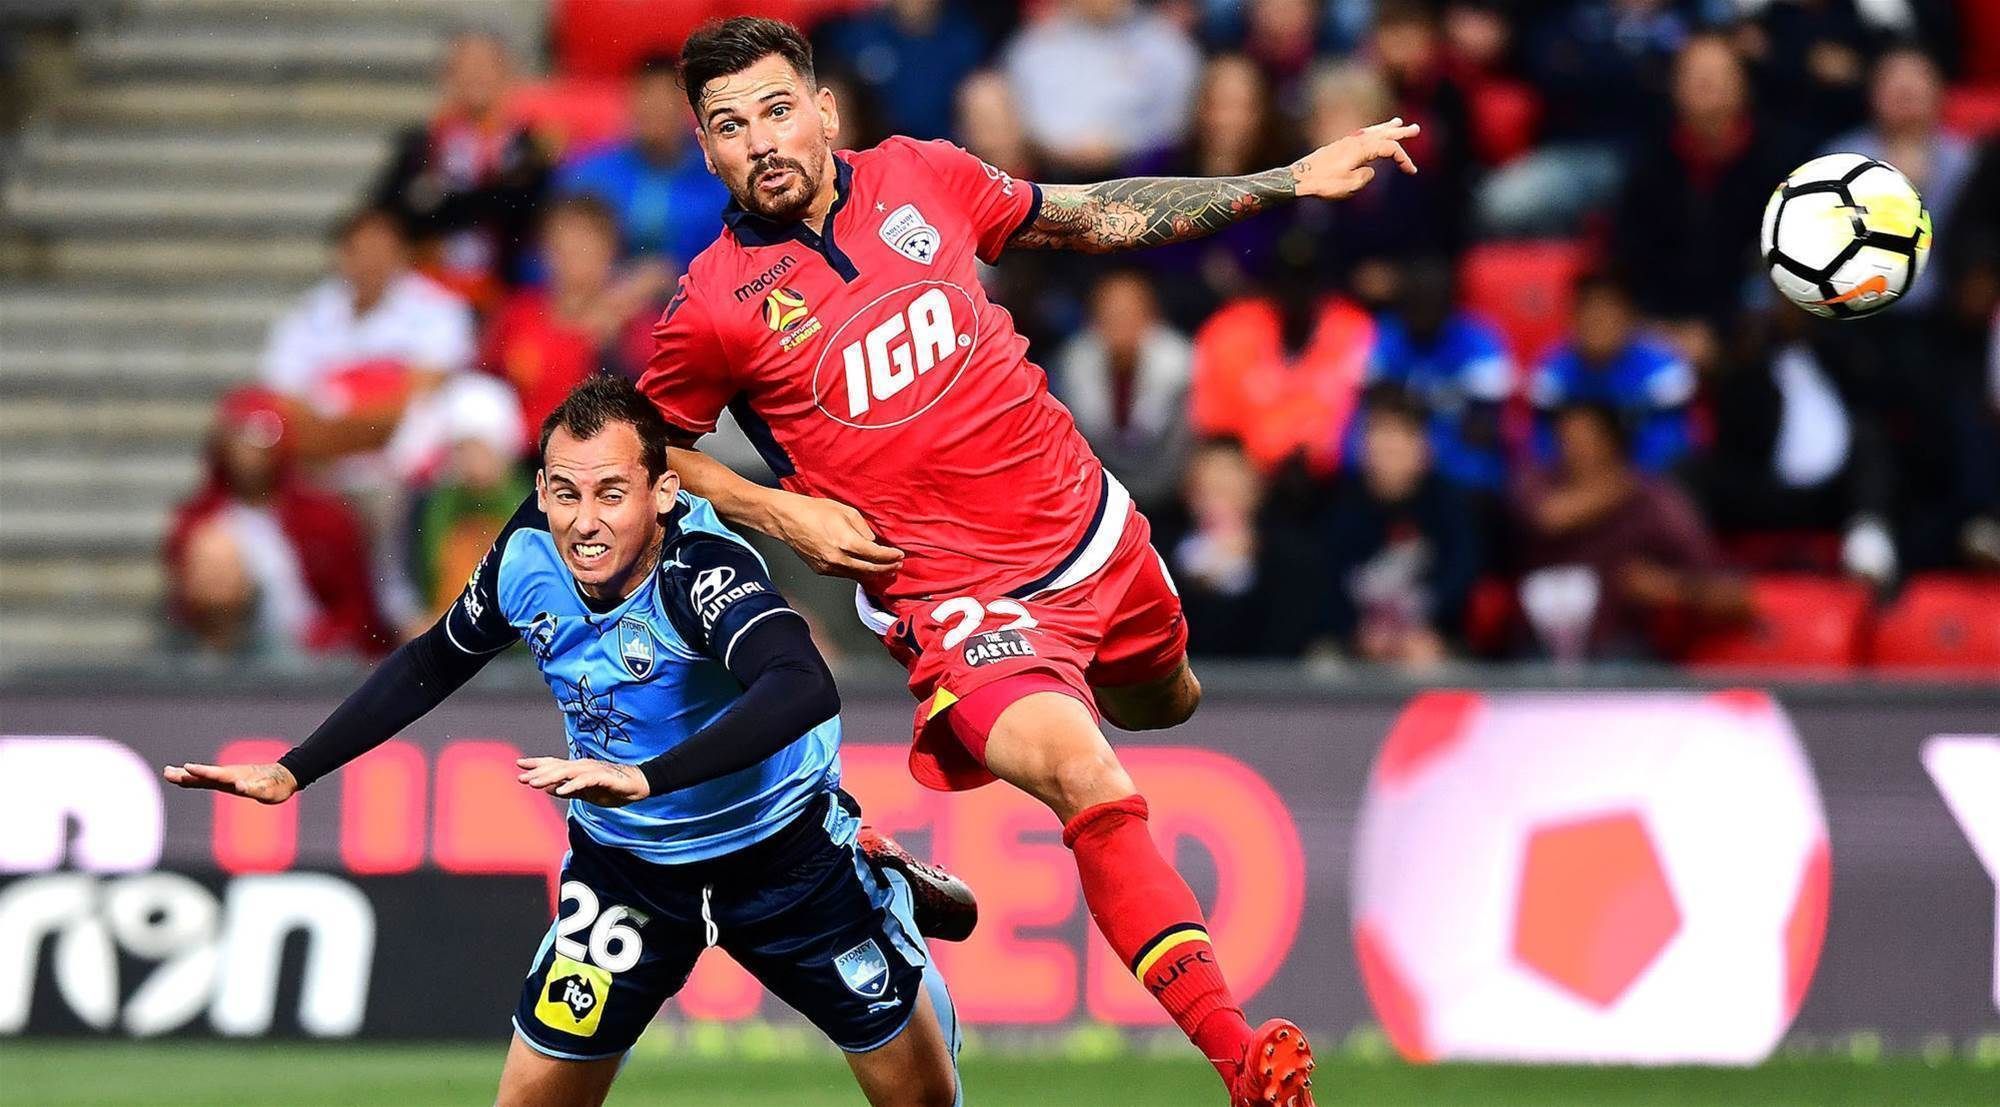 Wilkshire hails 'resilient' Sydney FC